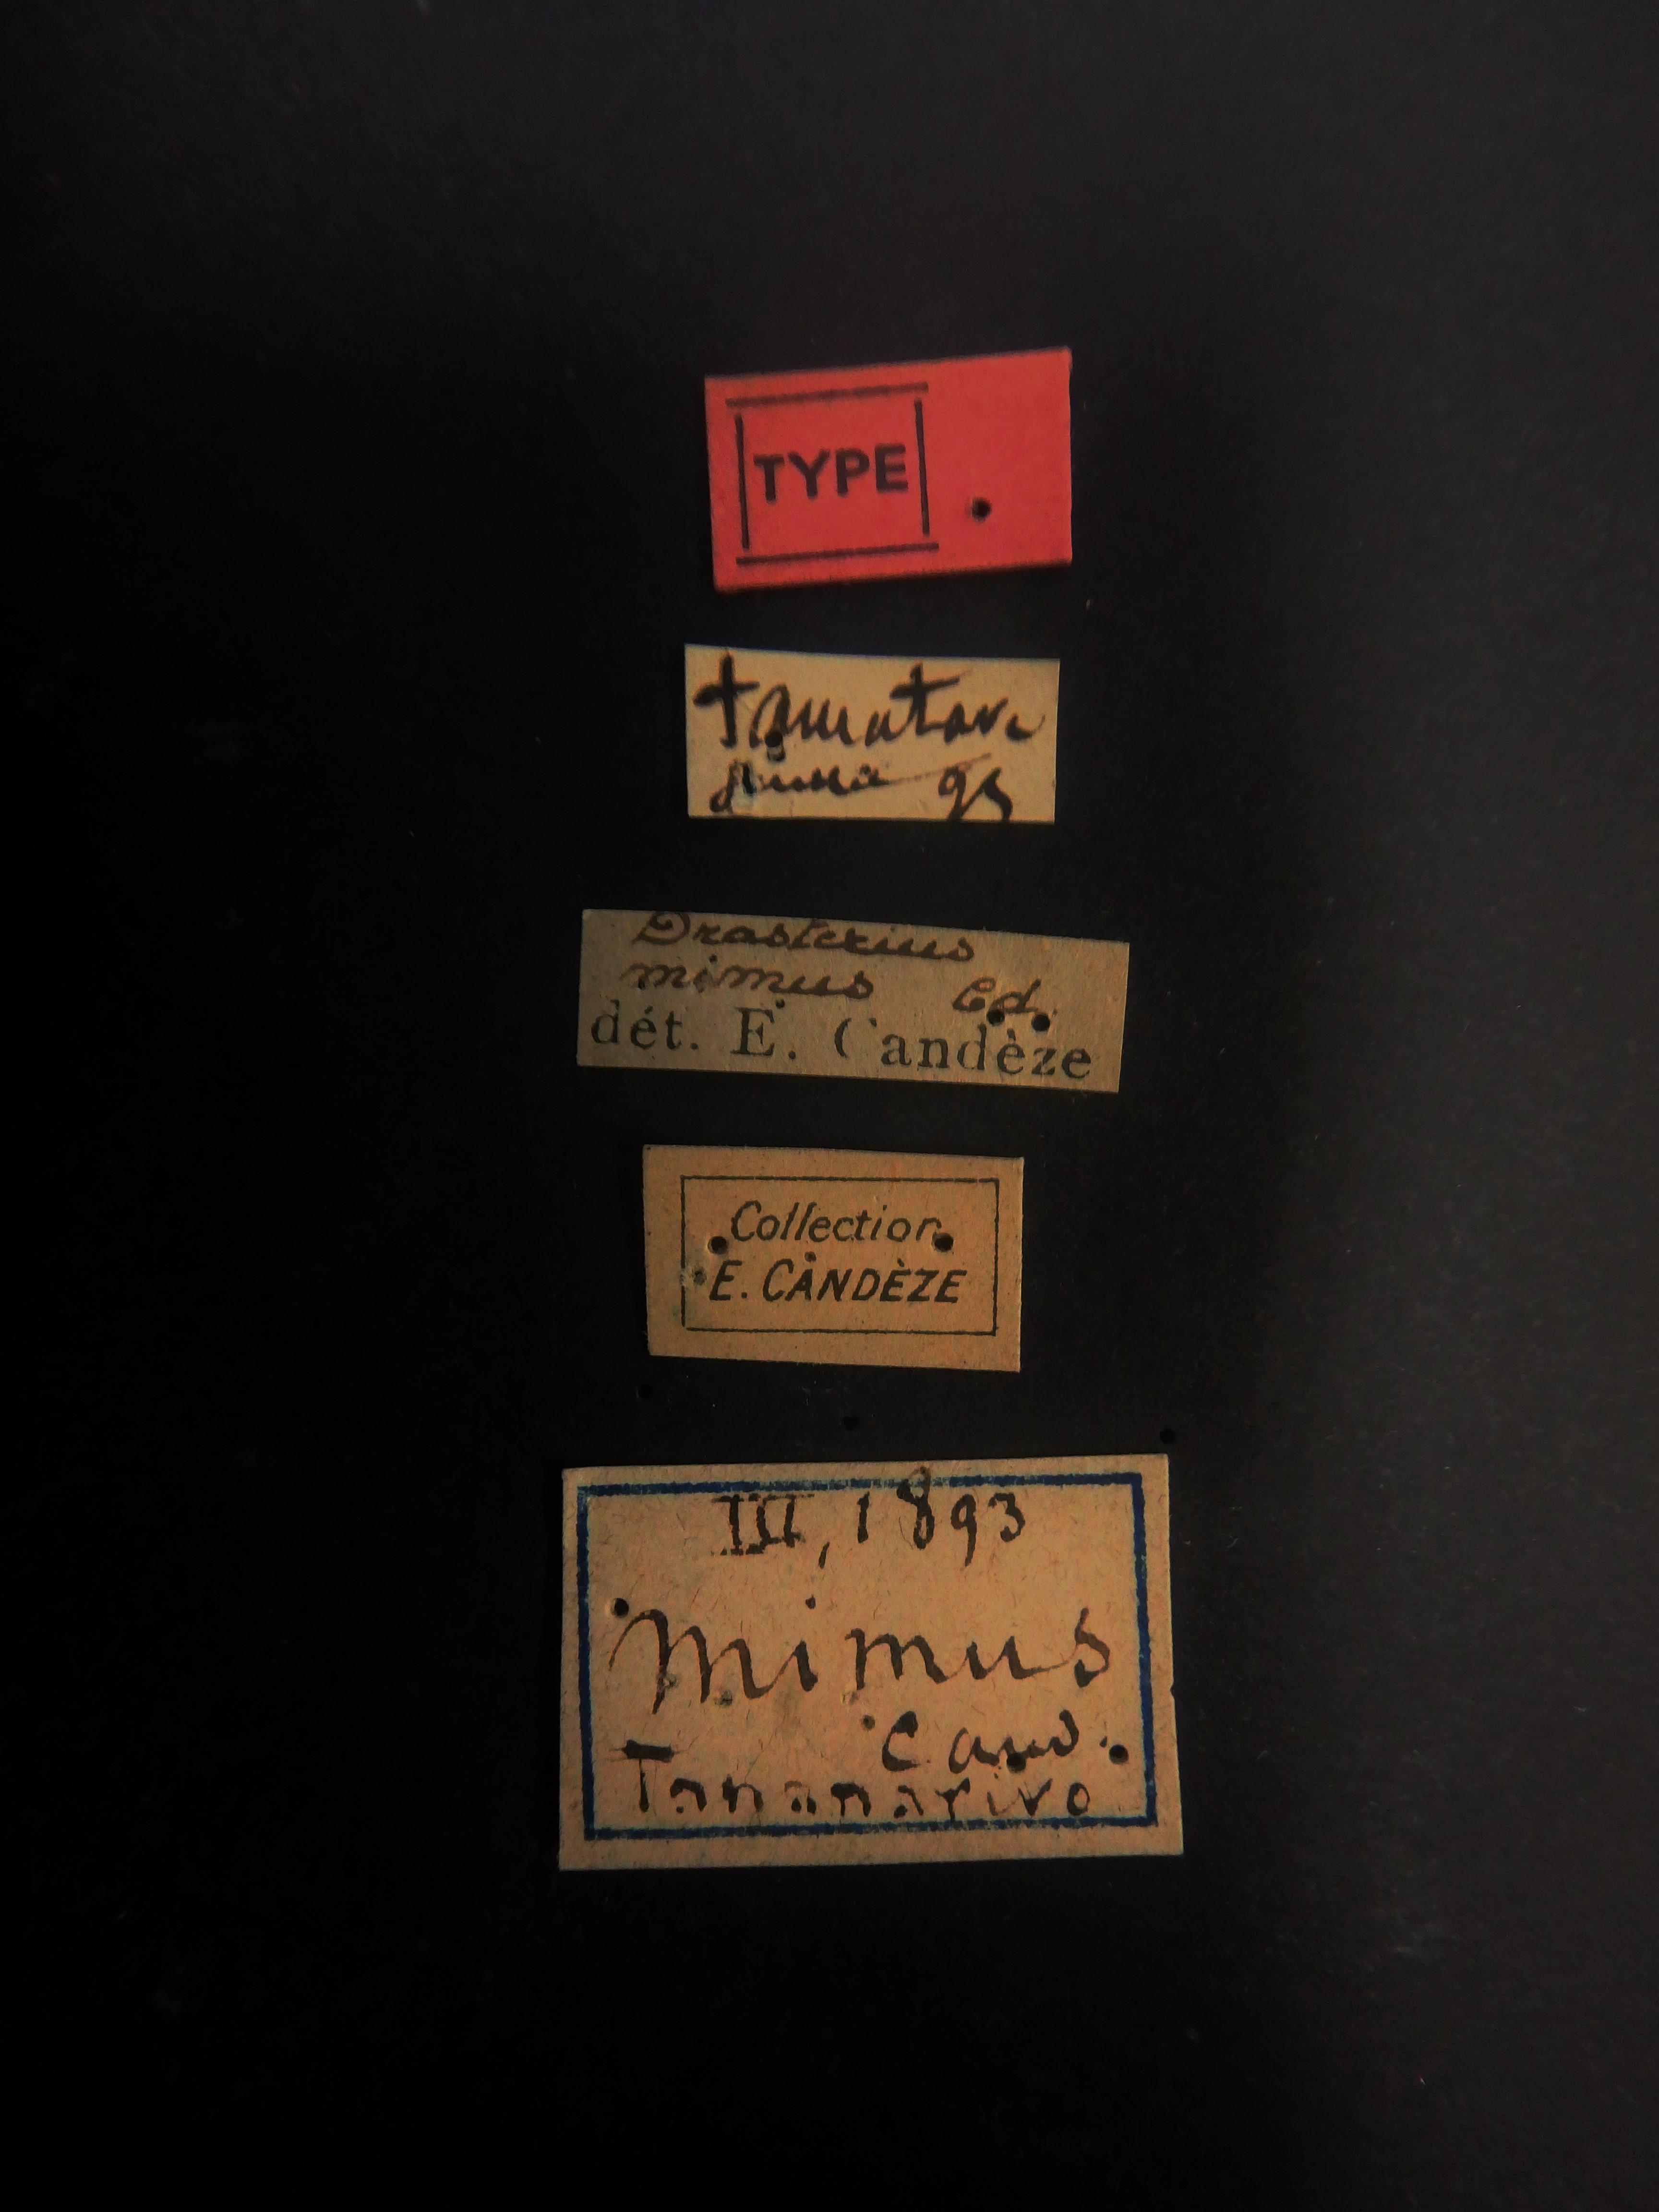 Drasterius mimus t Labels.JPG